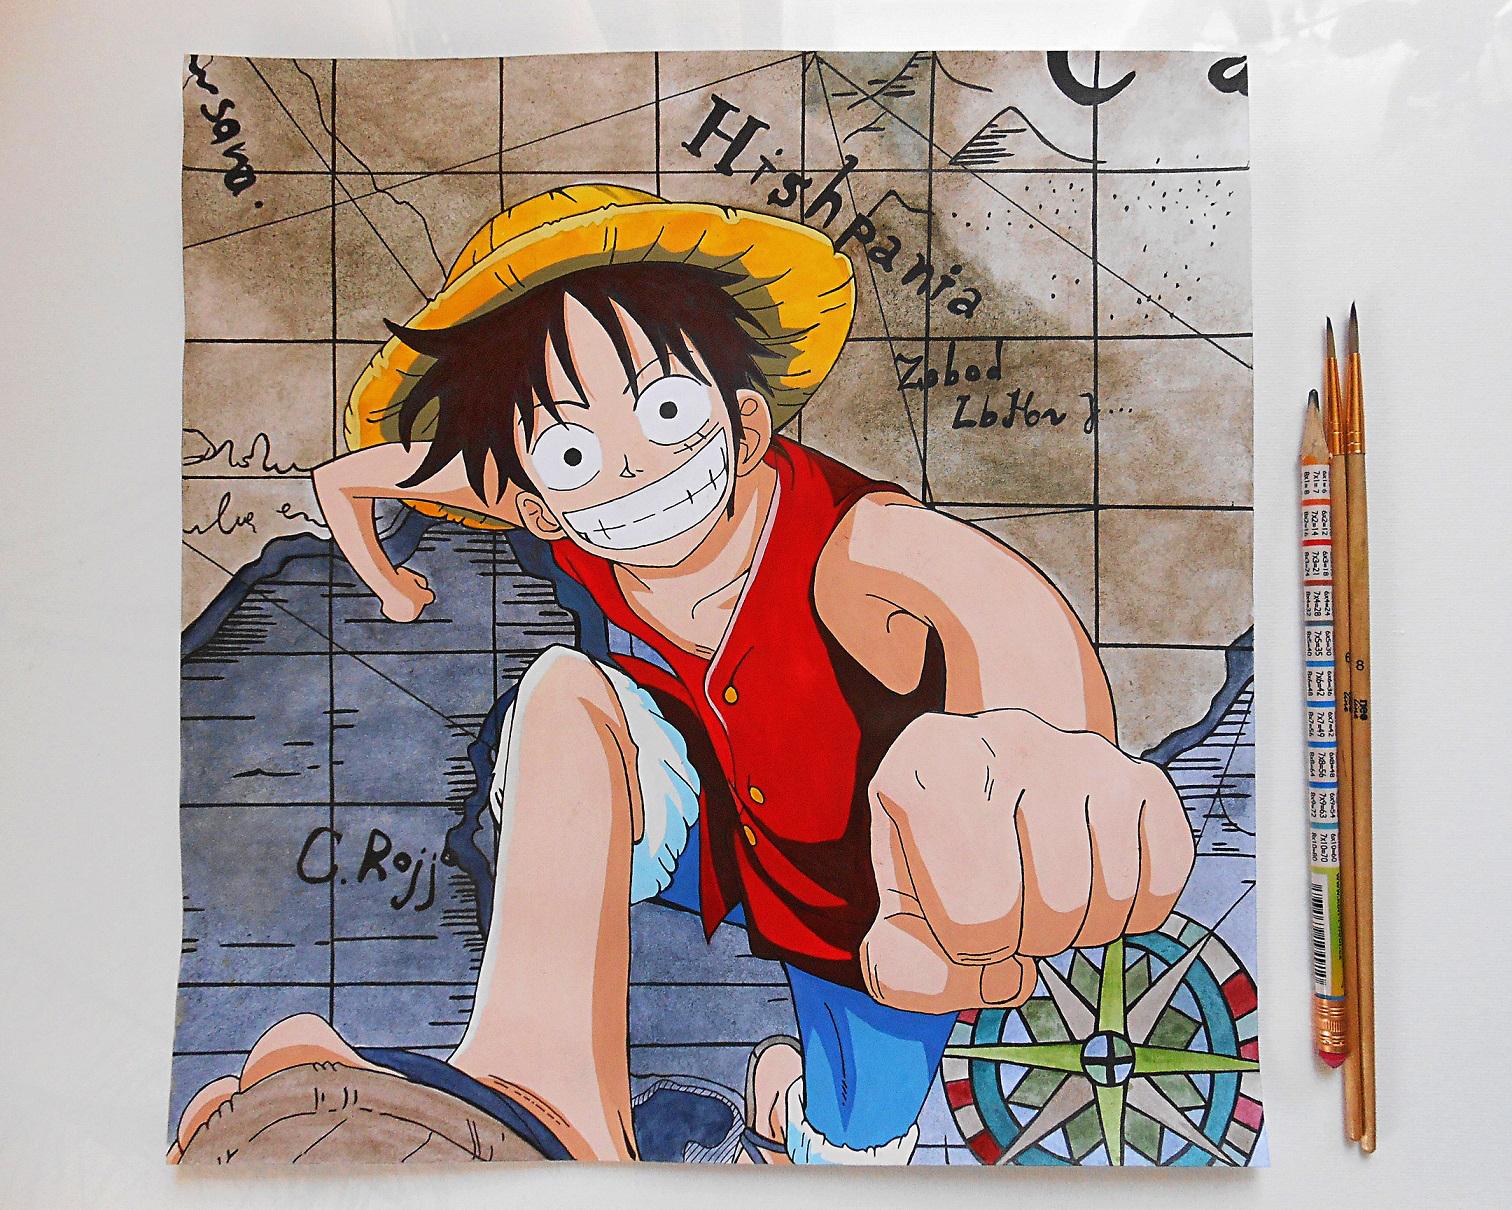 Dessins, Luffy Color Drawing From One Piece Anime, Page 428 dedans Dessin Animé De One Piece